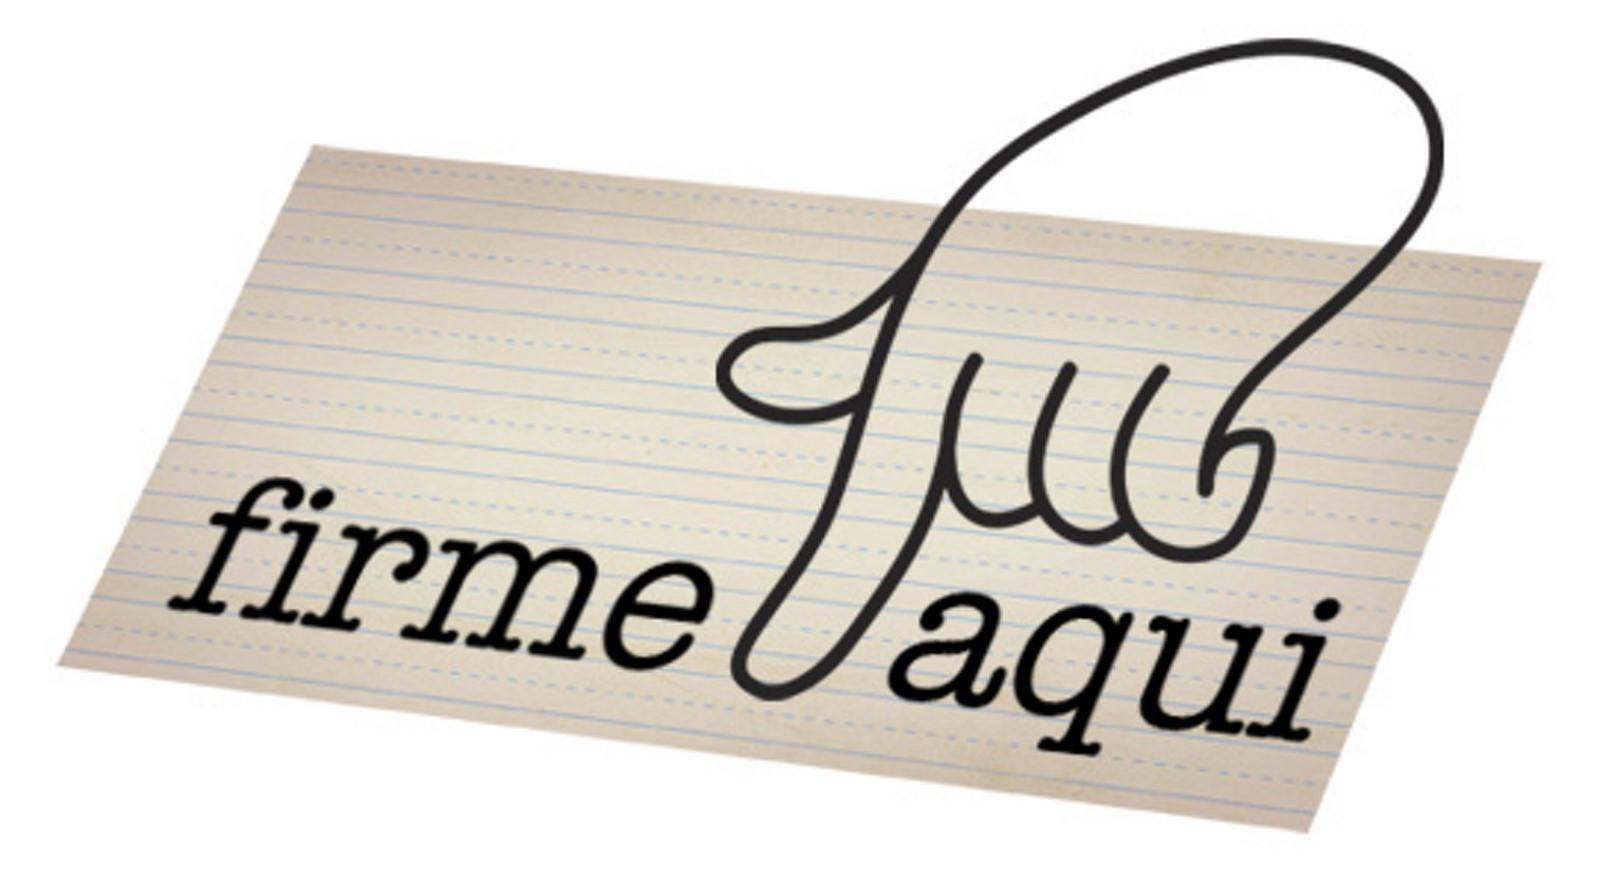 Gu a de contrato de arras bilbao inmobiliaria somera for Clausula suelo firma acuerdo privado